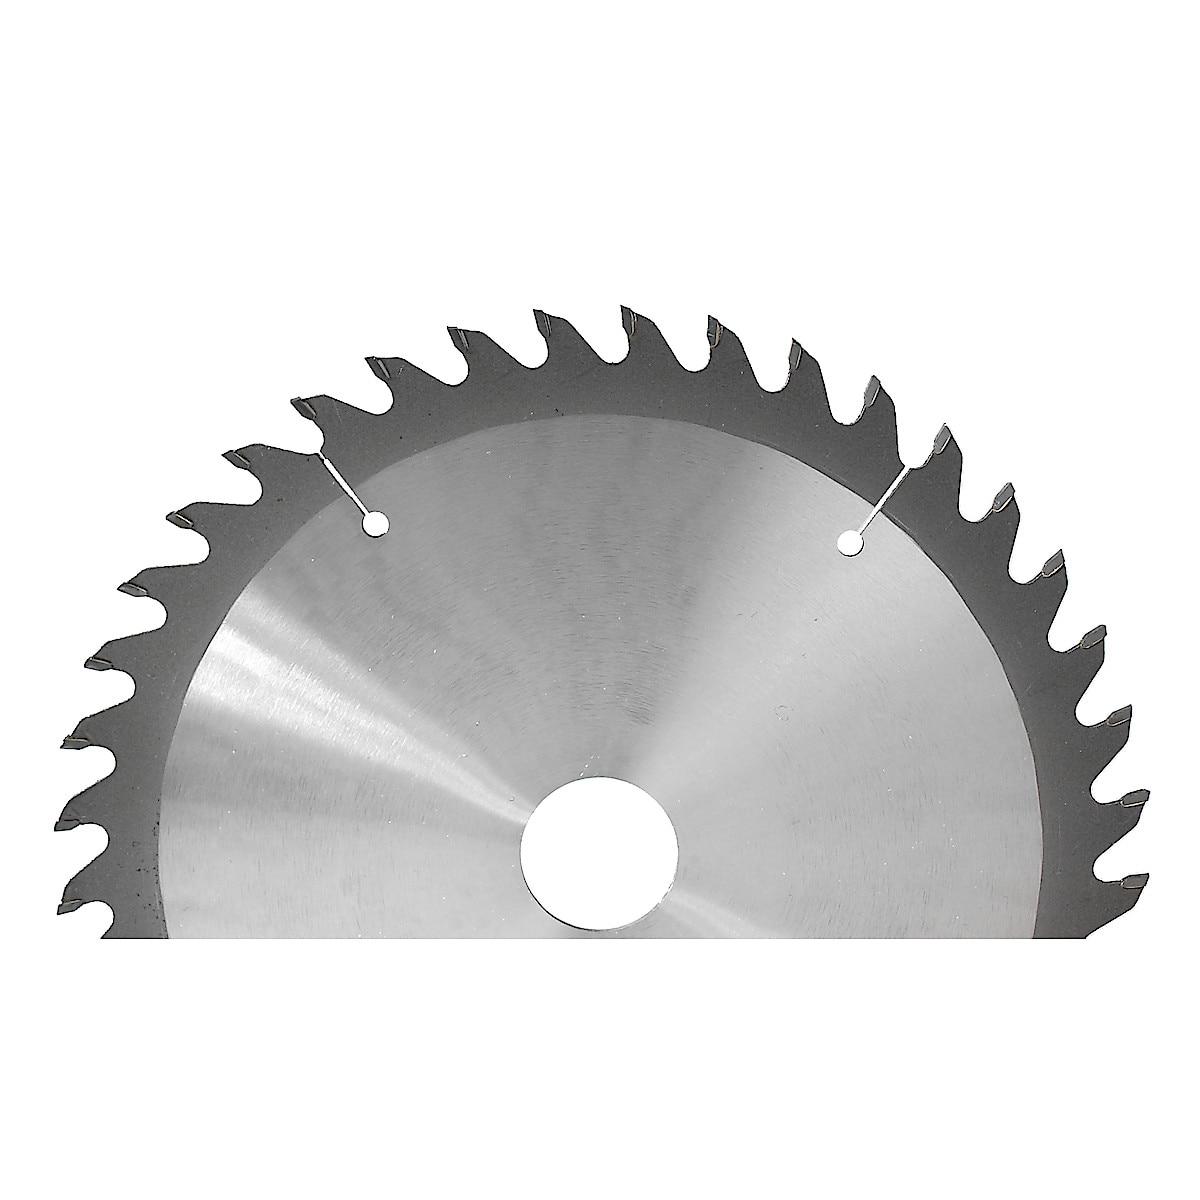 Sågklinga 254 x 16 mm 60T negativ tandning Cocraft